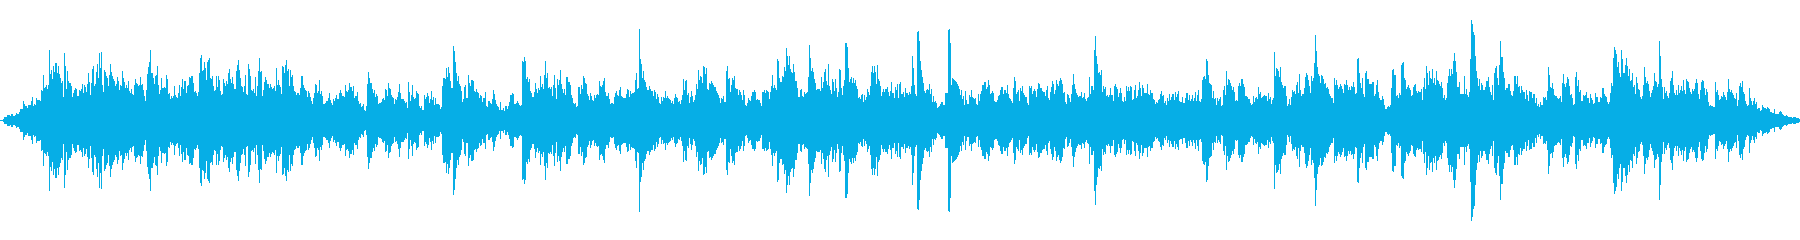 CLUNKY SLEIGH BEL...の再生済みの波形